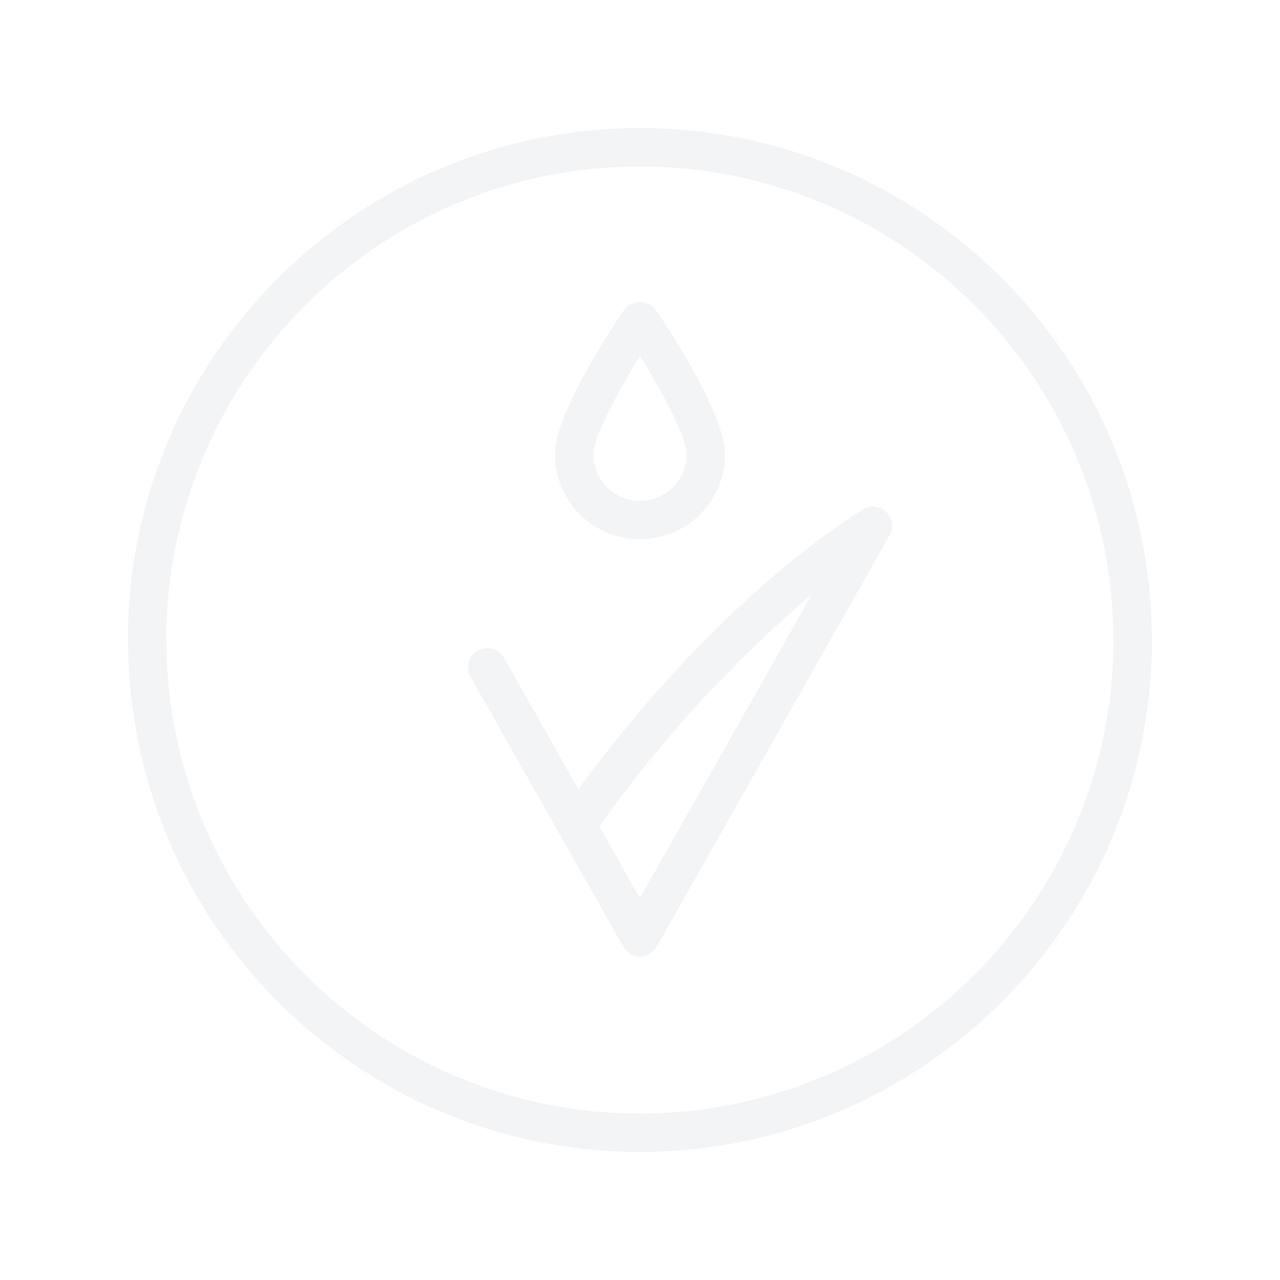 MILANI Shine Proof Powder 12.3g